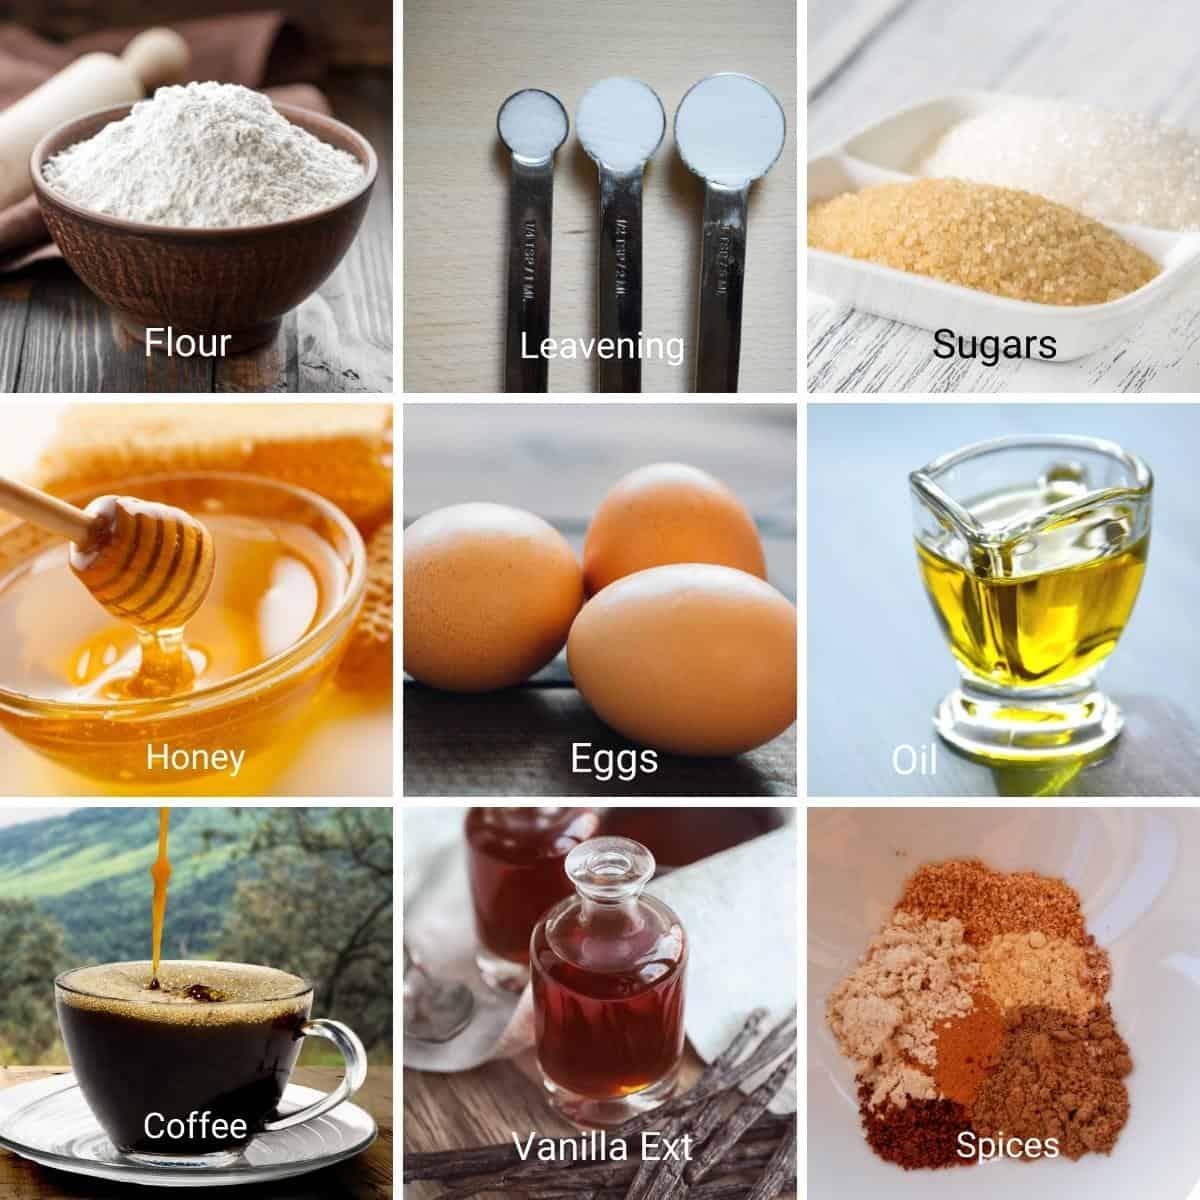 Ingredients for honey cakes recipe.